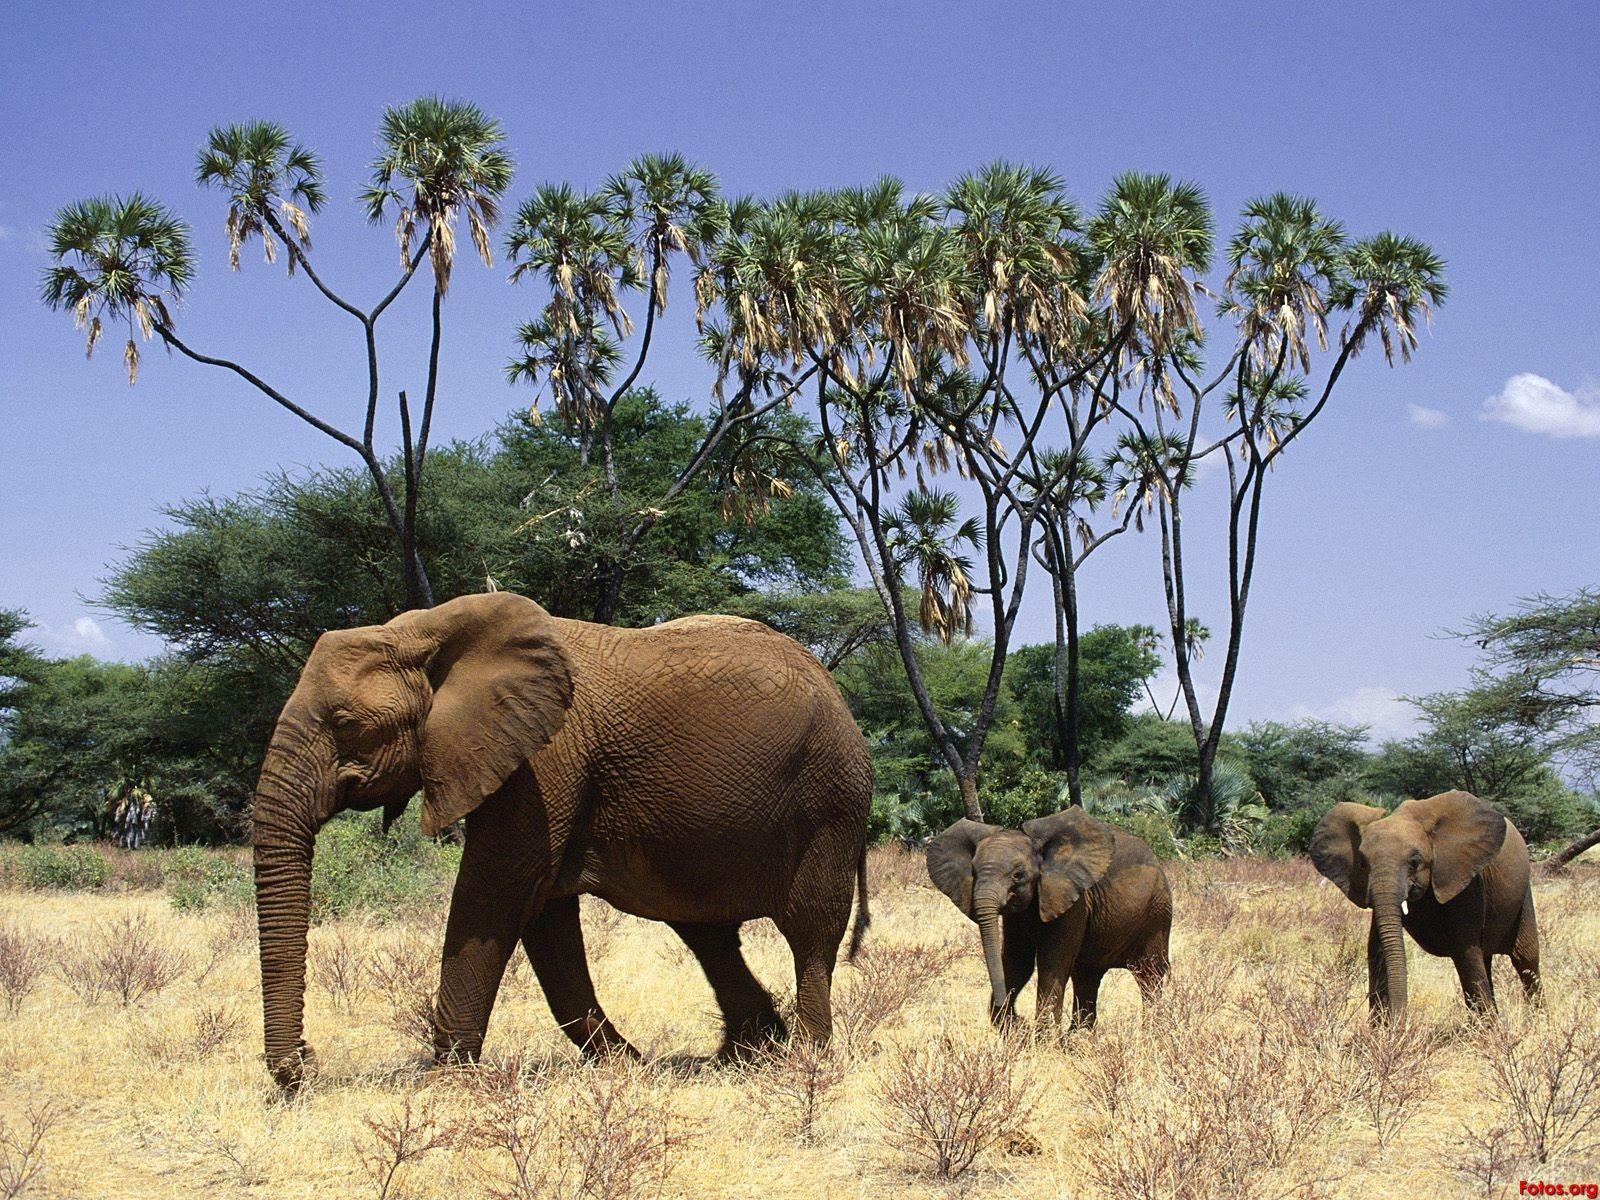 Un paseo por la selva | Los elefantes de Sal Elefante | Pinterest ...